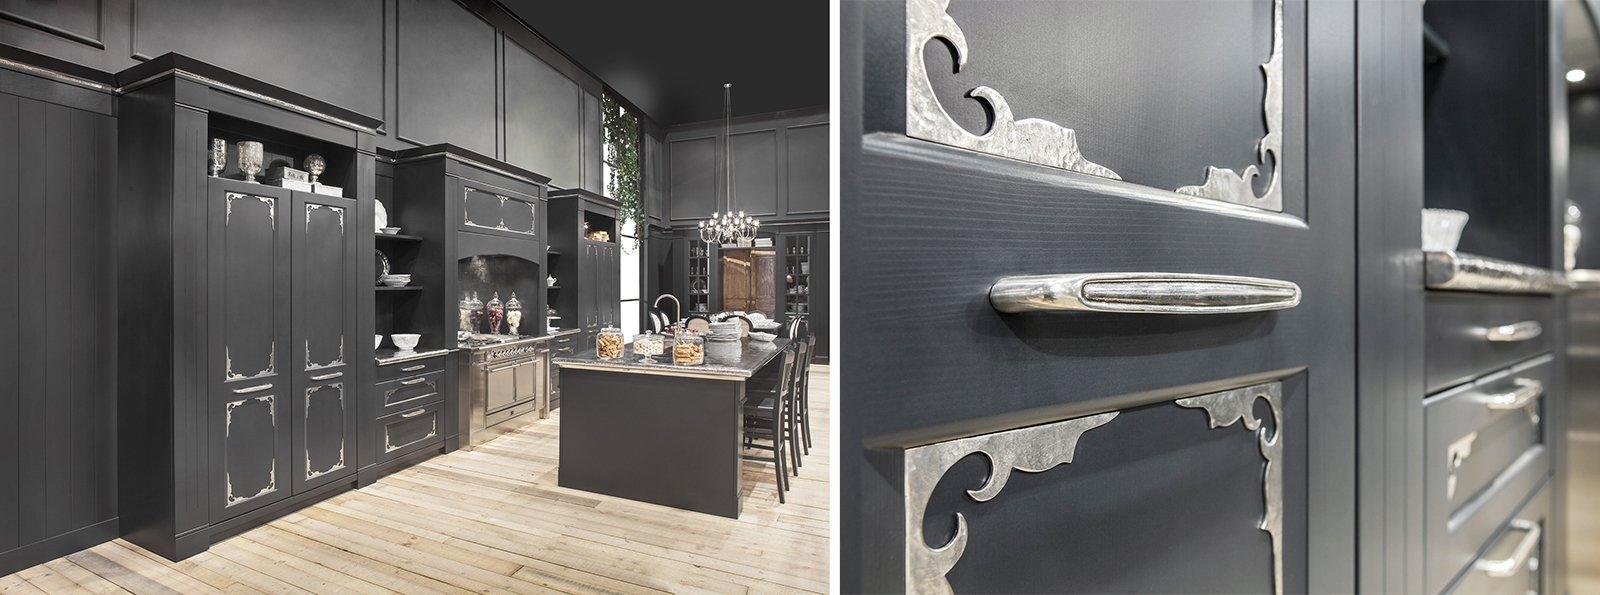 Cucine decorate per un ambiente originale e vivace cose di casa - Ante per cucina prezzi ...